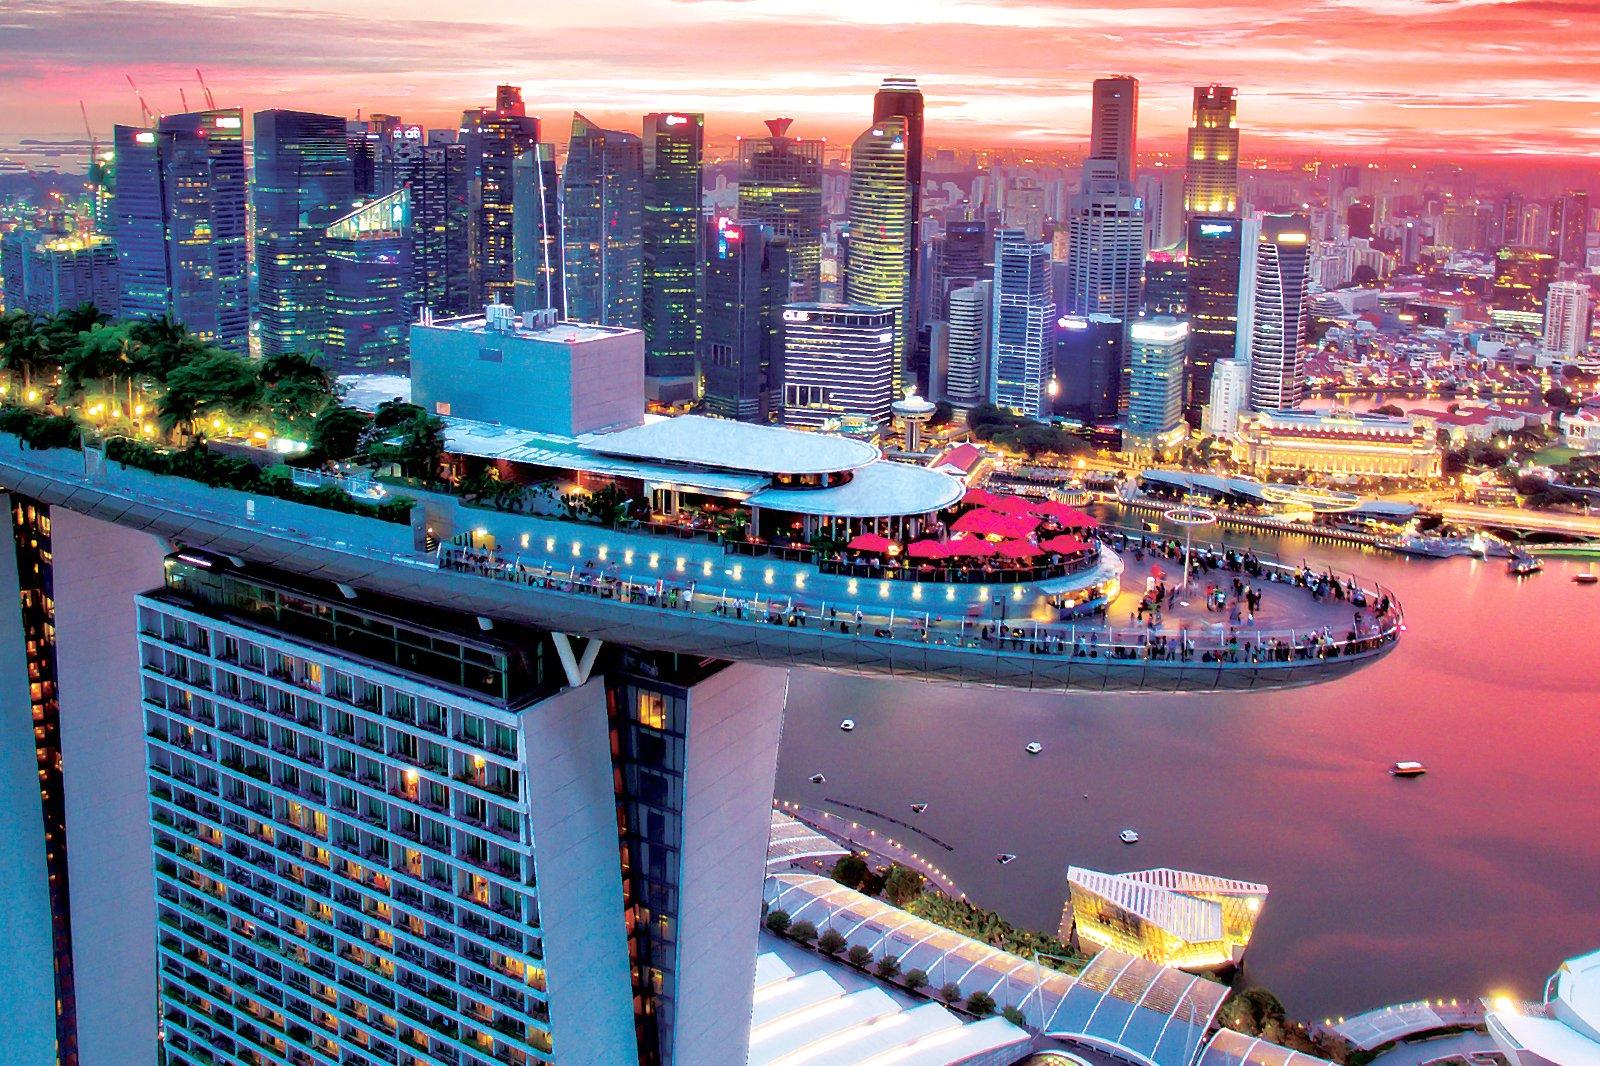 Marina Bay Sands - Hotel, Shopping, and Entertainment